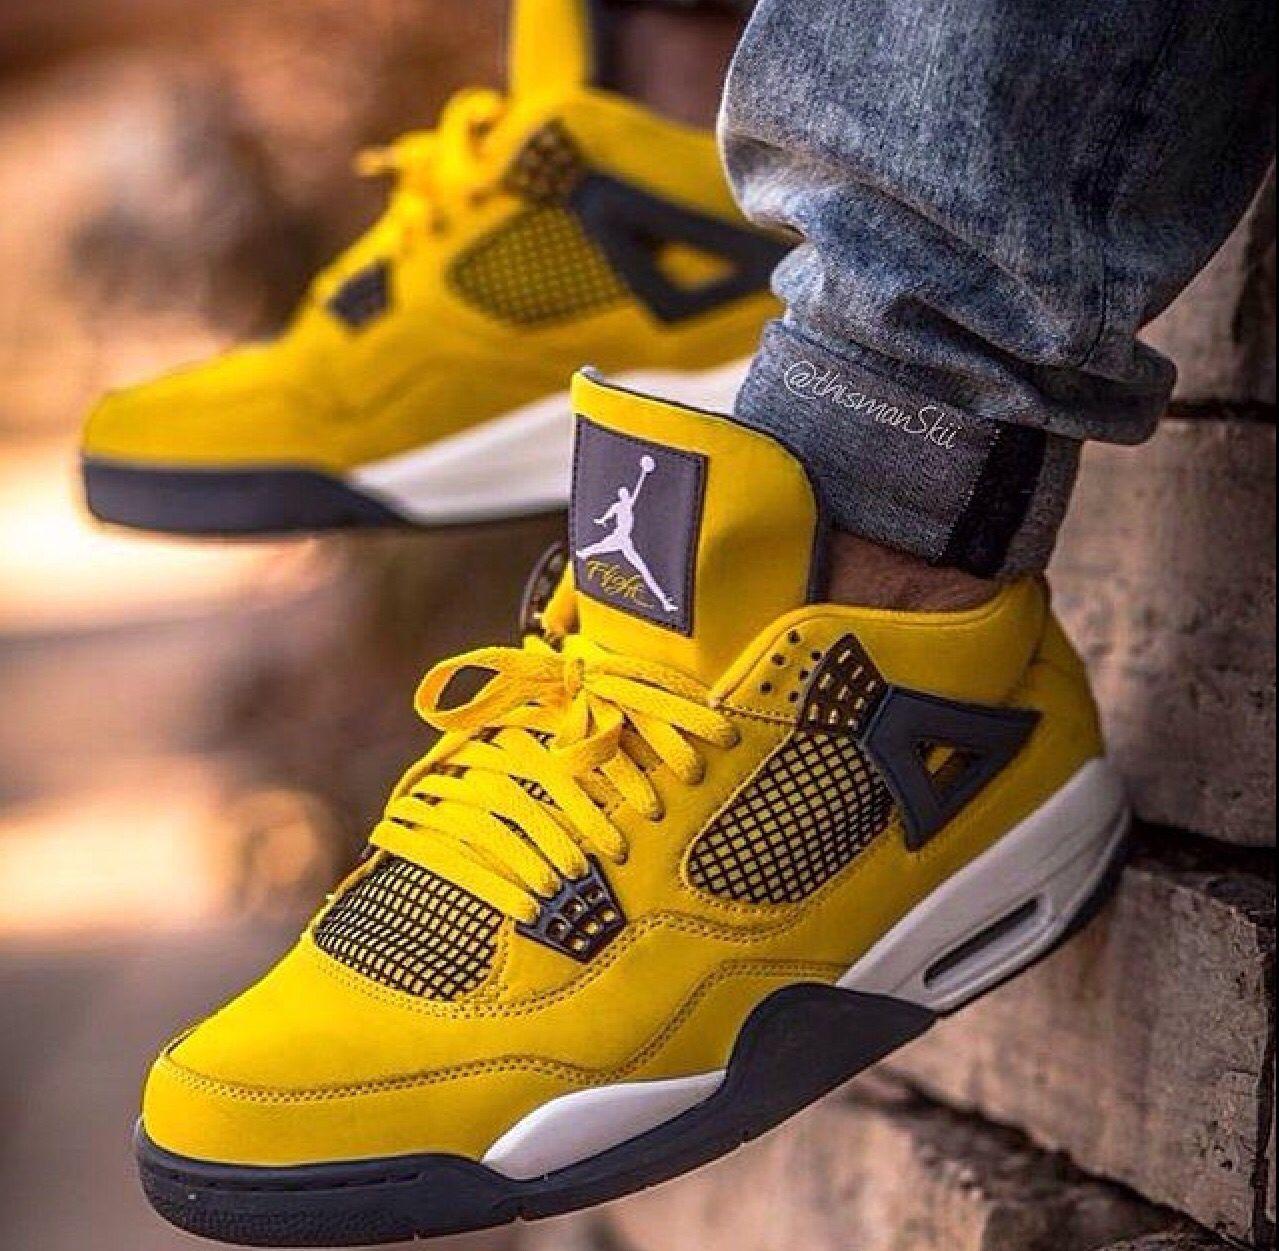 Lightning 4's Nike shoes women, Air jordans retro